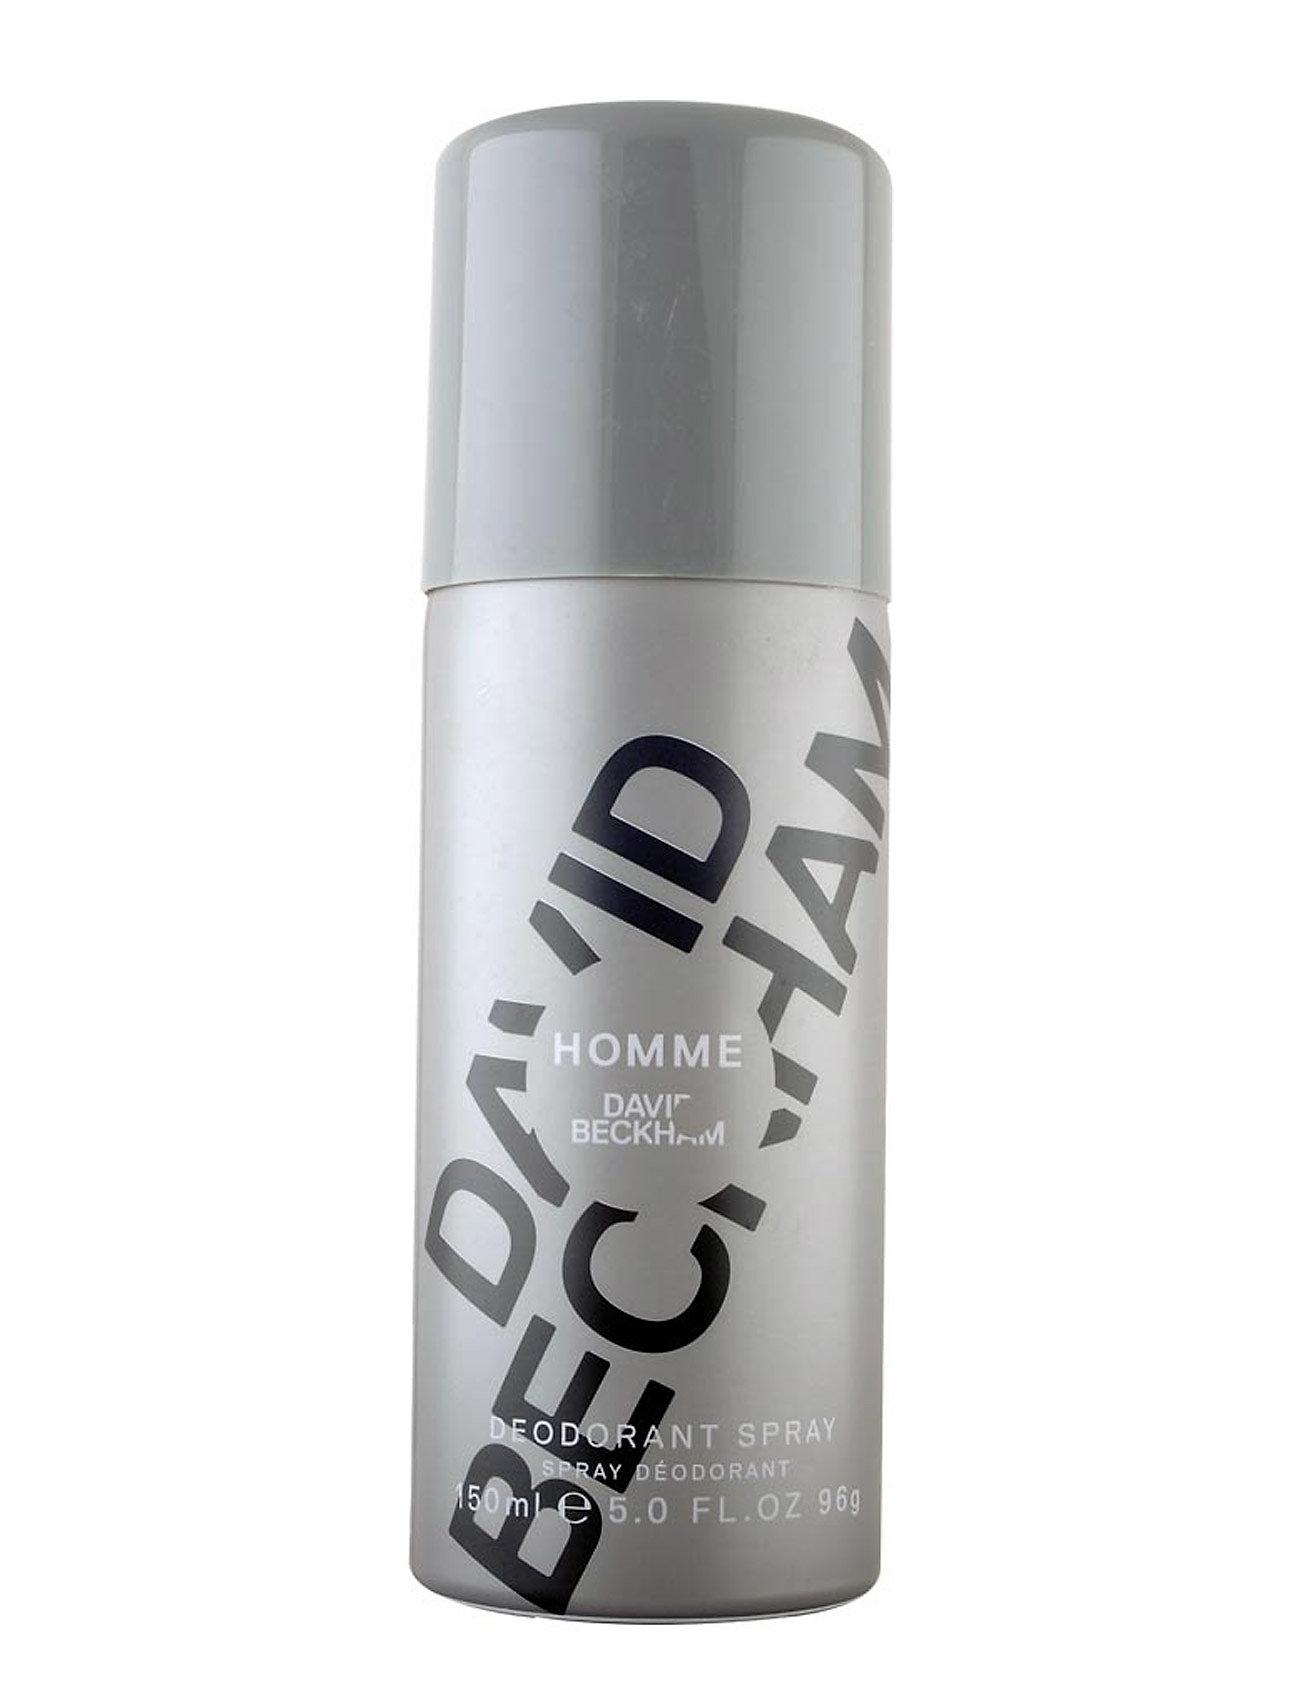 david beckham – David beckham homme deodorant spray på boozt.com dk